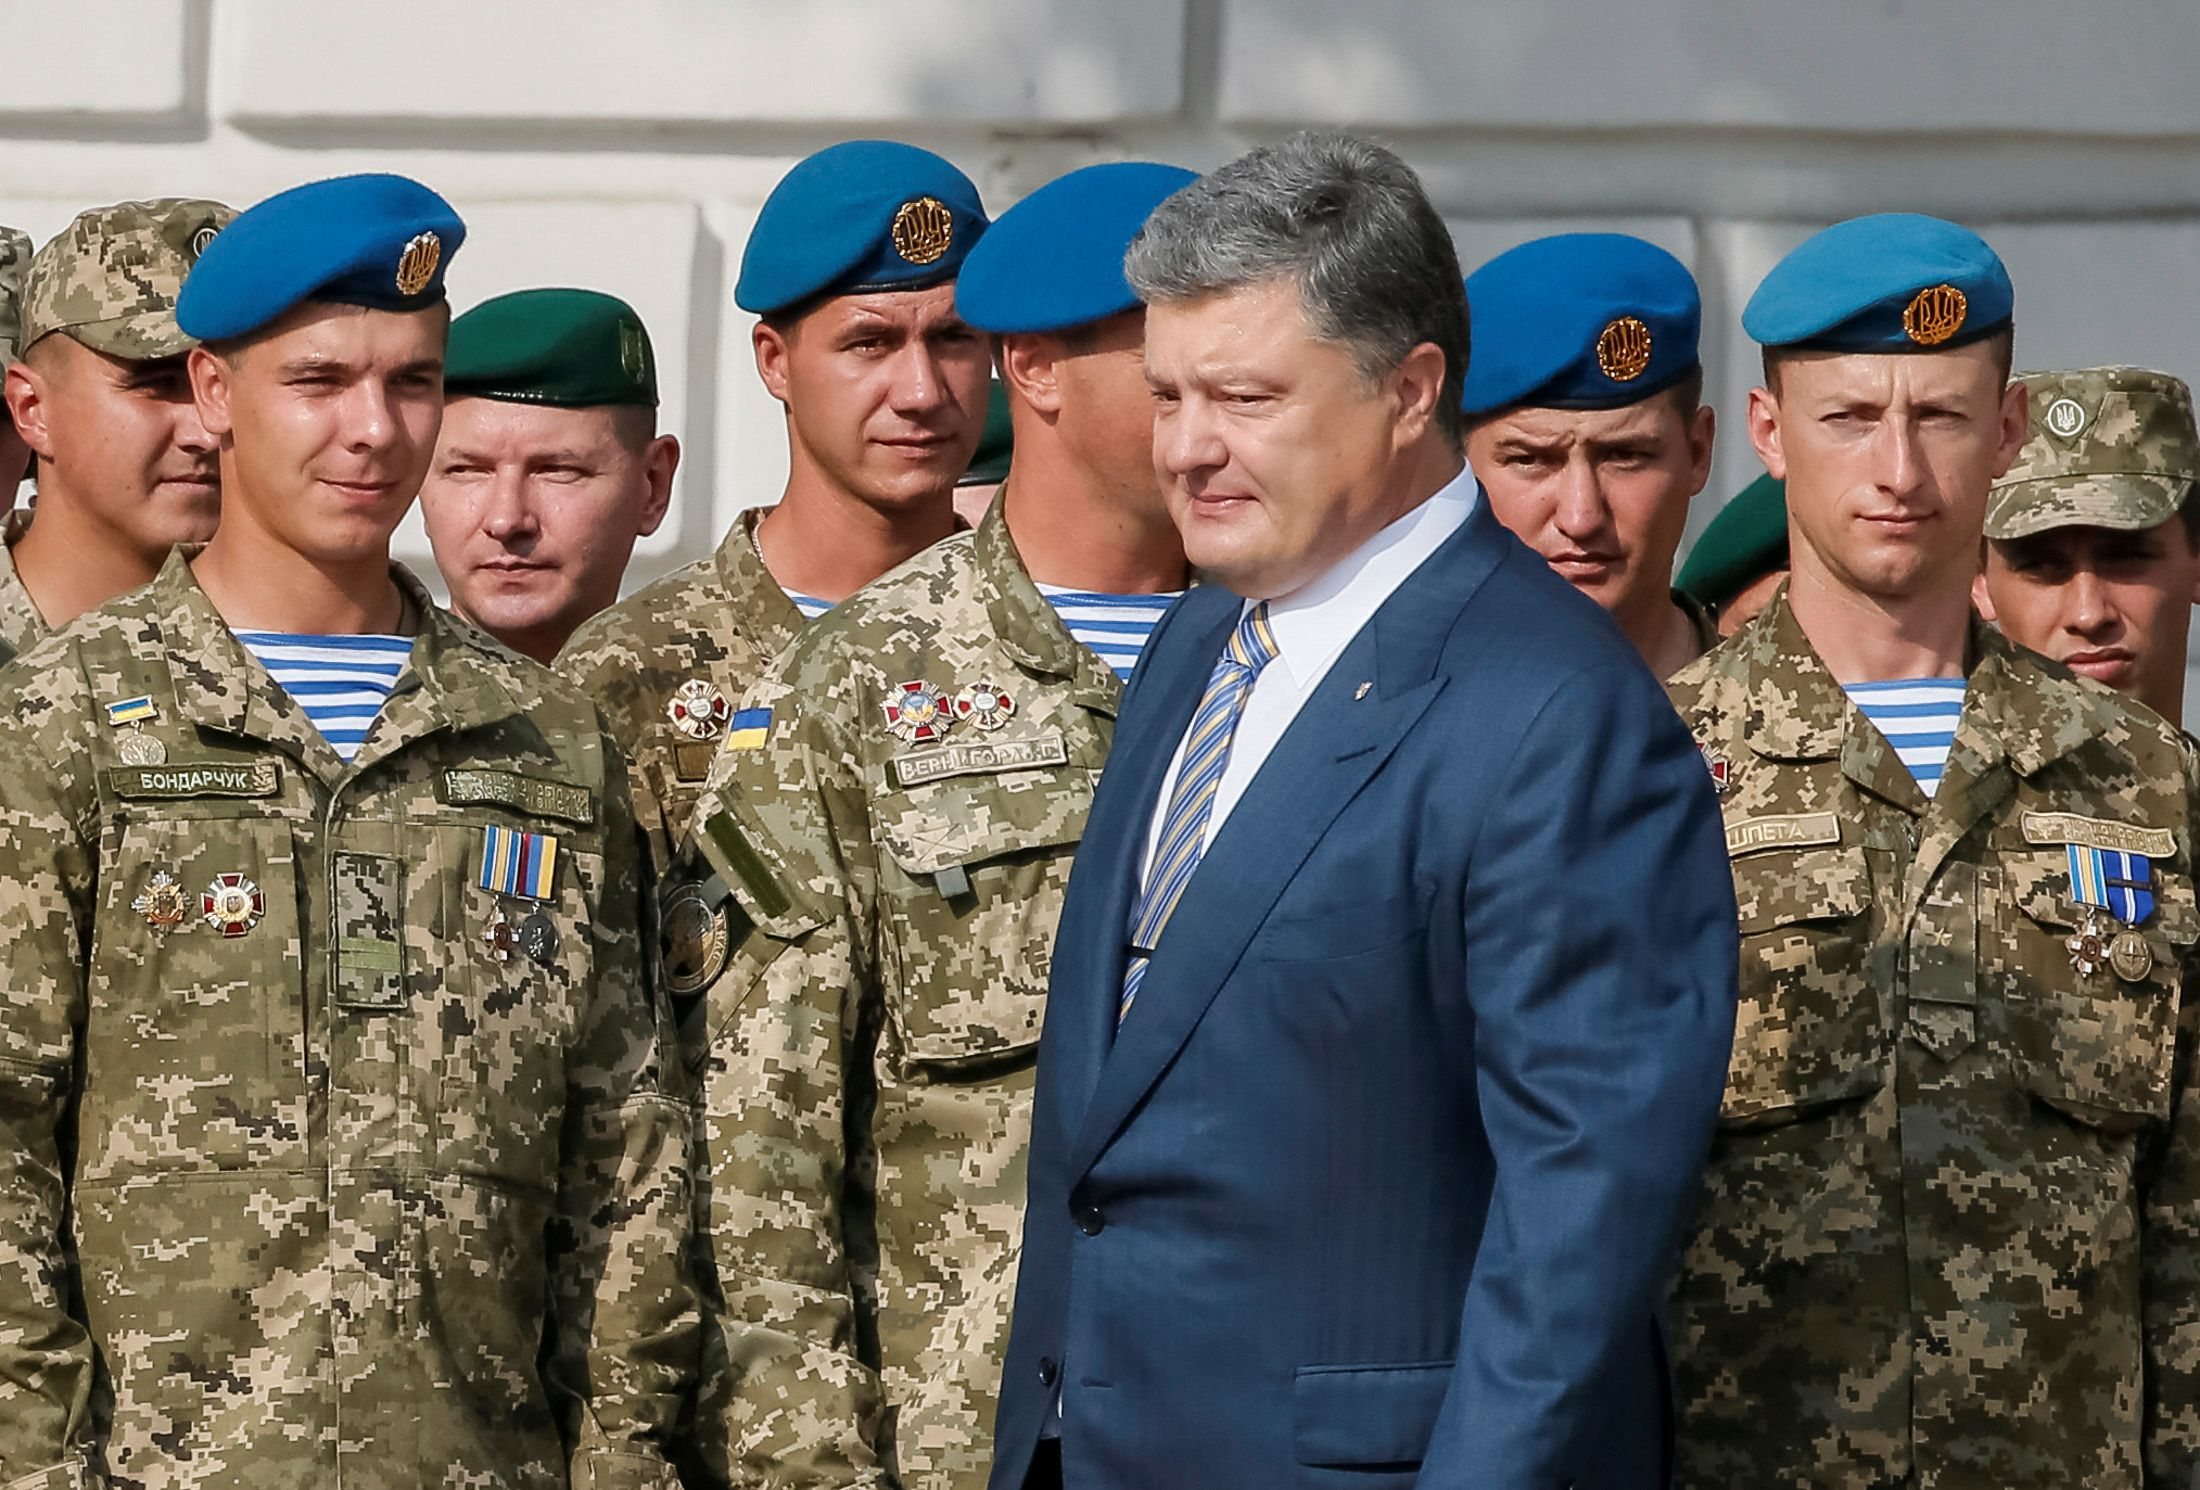 Poroshenko and Ukrainian soldiers